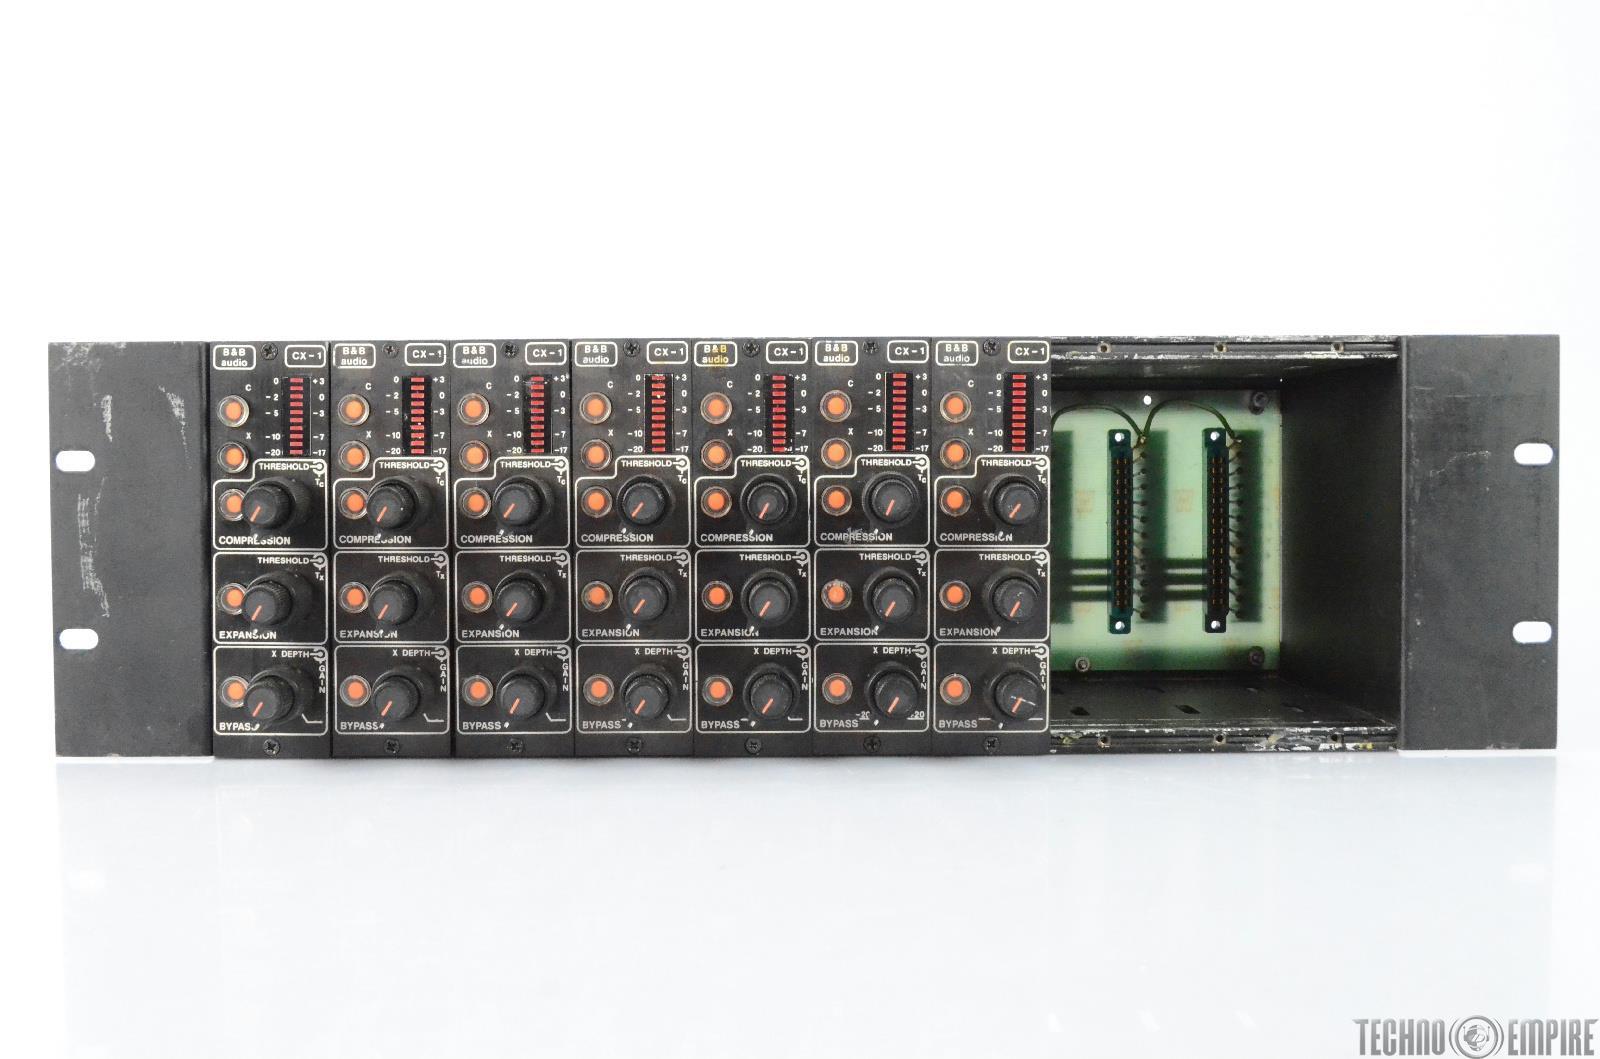 7 B&B Aphex CX-1 Compressor Expanders w/ Rack Grandmaster Recorders #28810